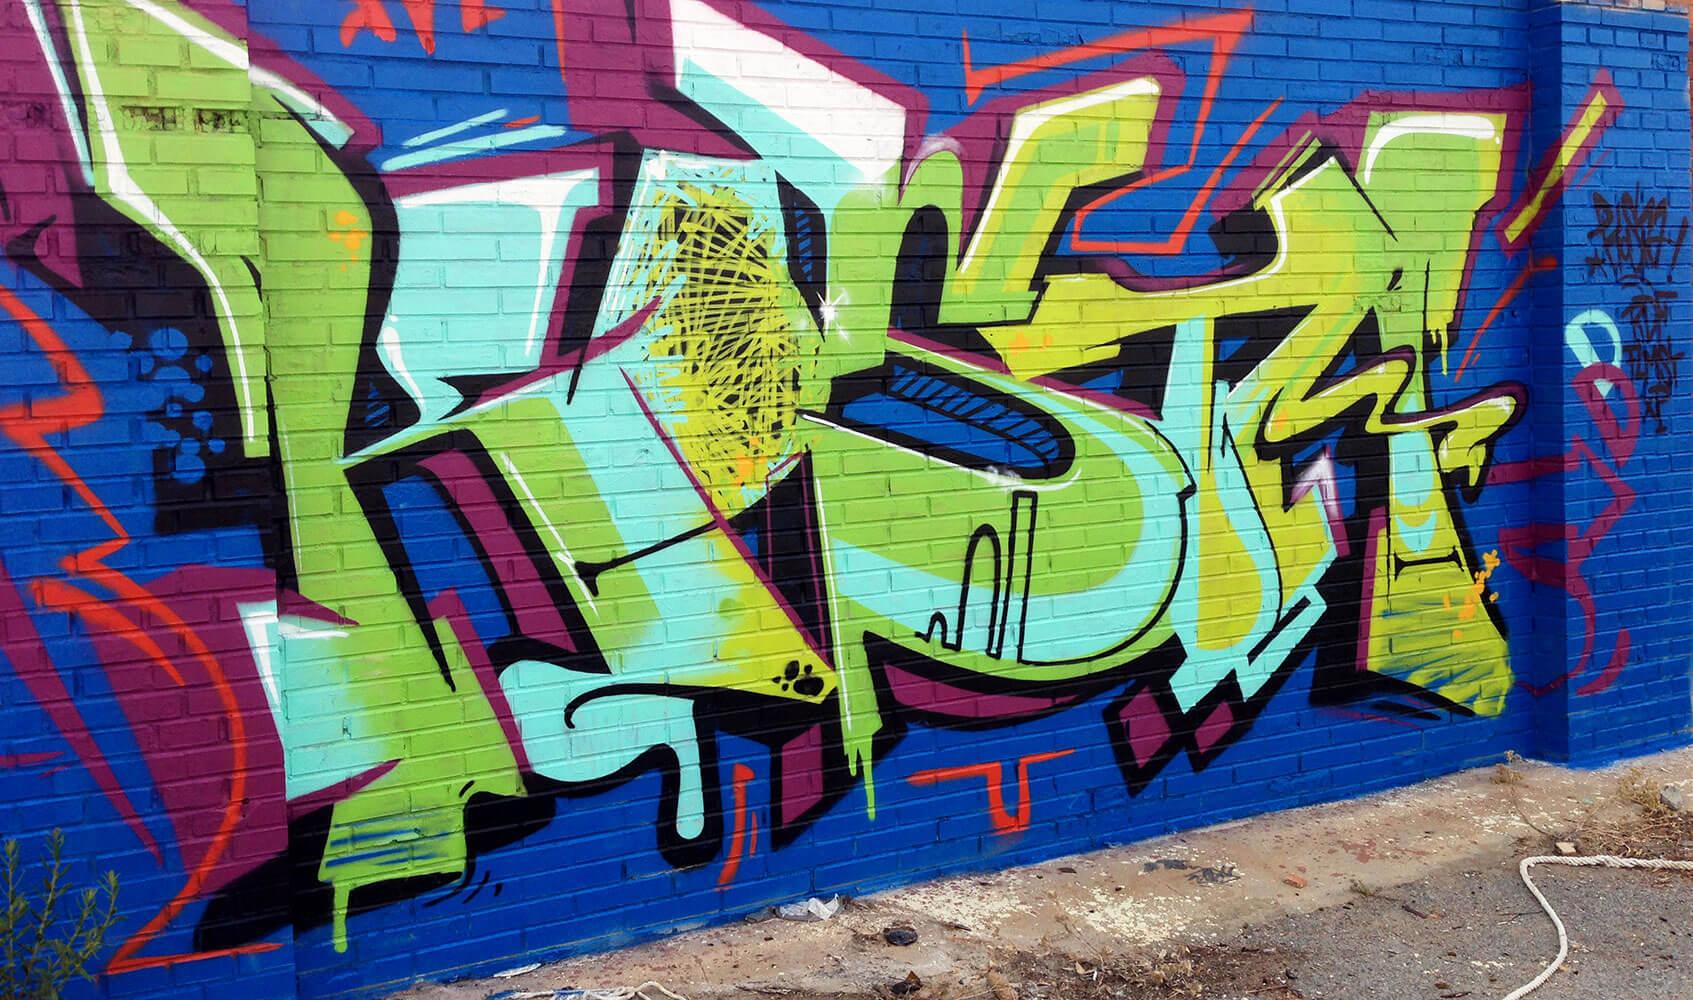 "Graffiti in Malaga ""Kosta"" by artist Max Kosta 2015"